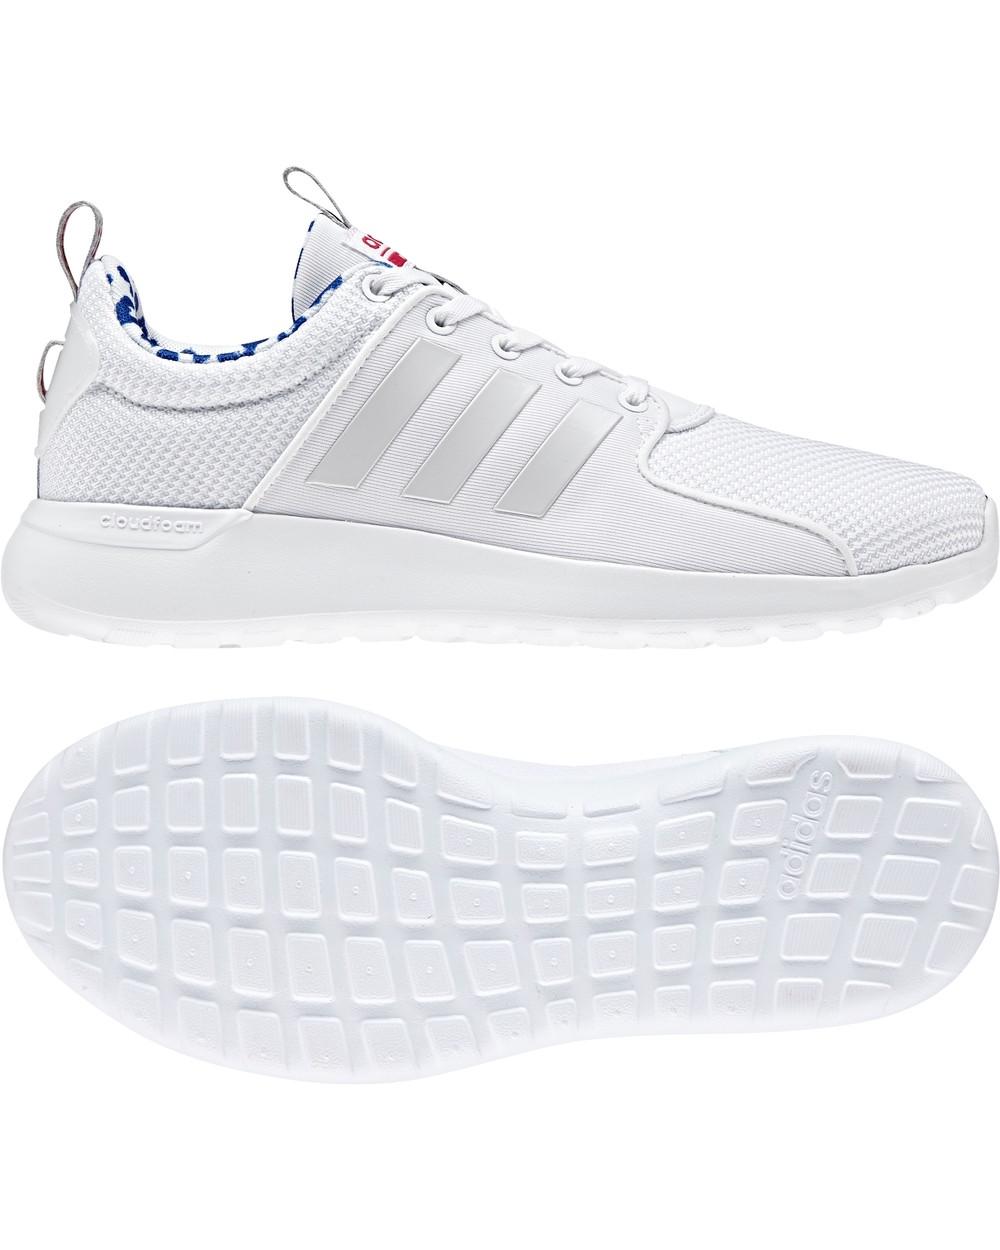 5 di 10 Adidas Scarpe ginnastica tennis sportive Sneakers Unisex Bianco Lite  Racer 3882b9dbf2a15